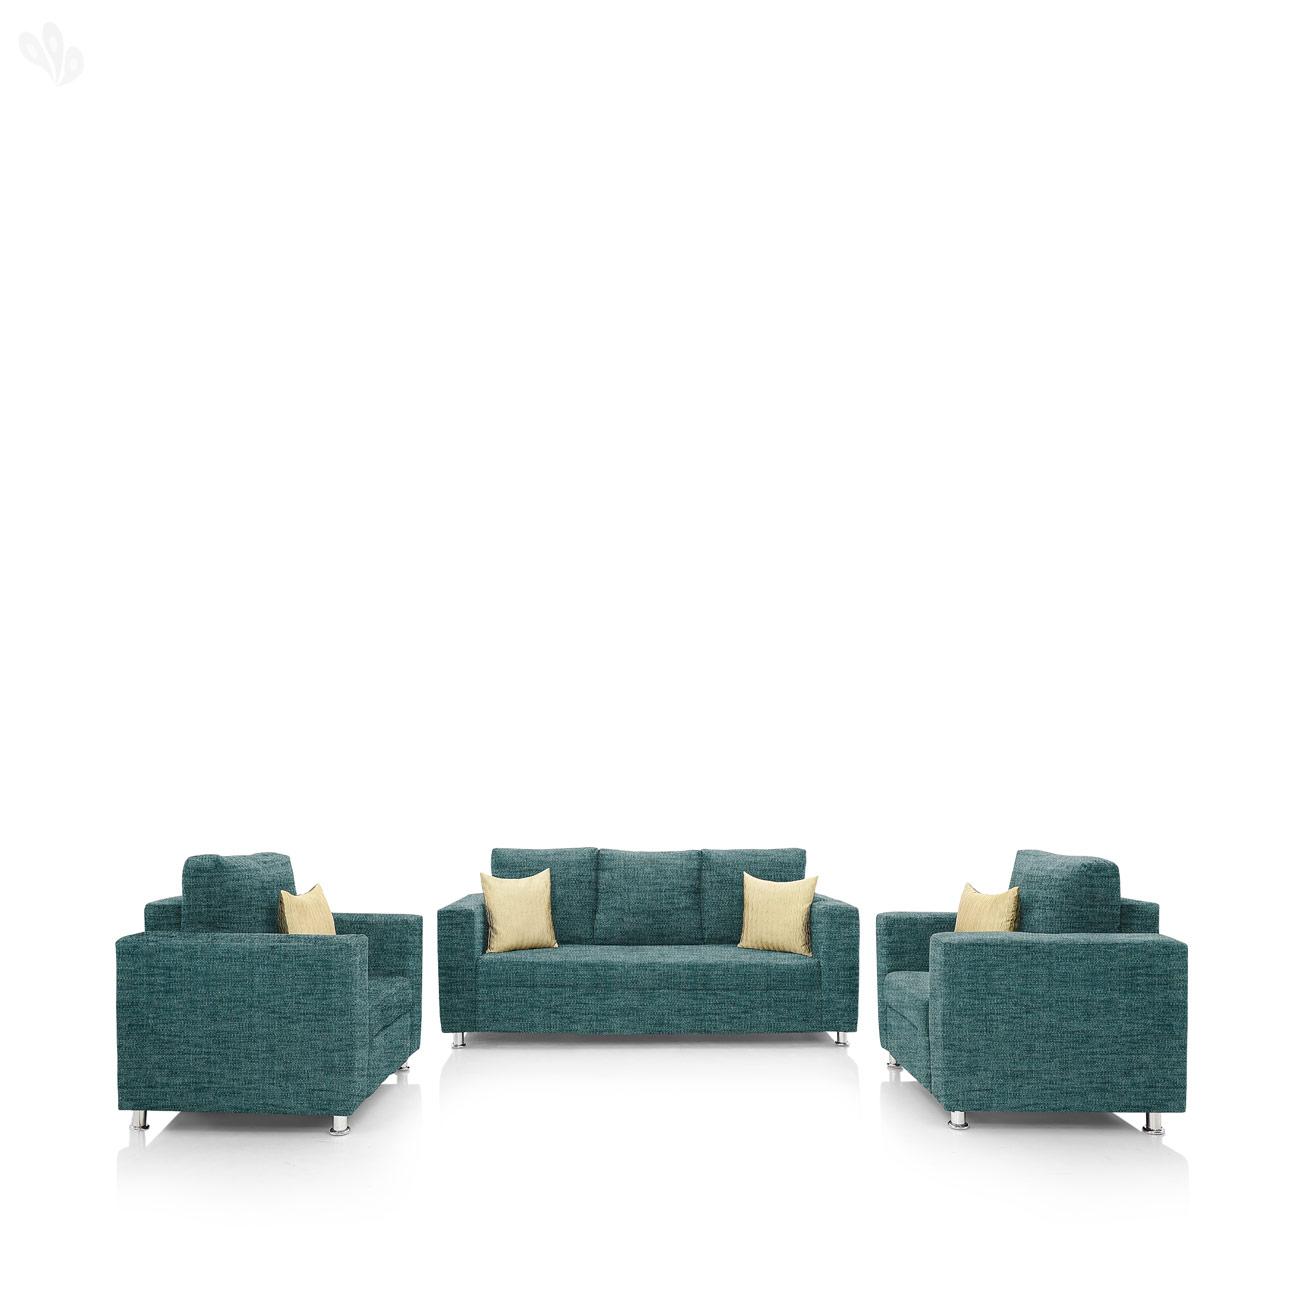 Earthwood   Fully Fabric Upholstered Sofa Set 3+1+1   Premium Valencia Teal